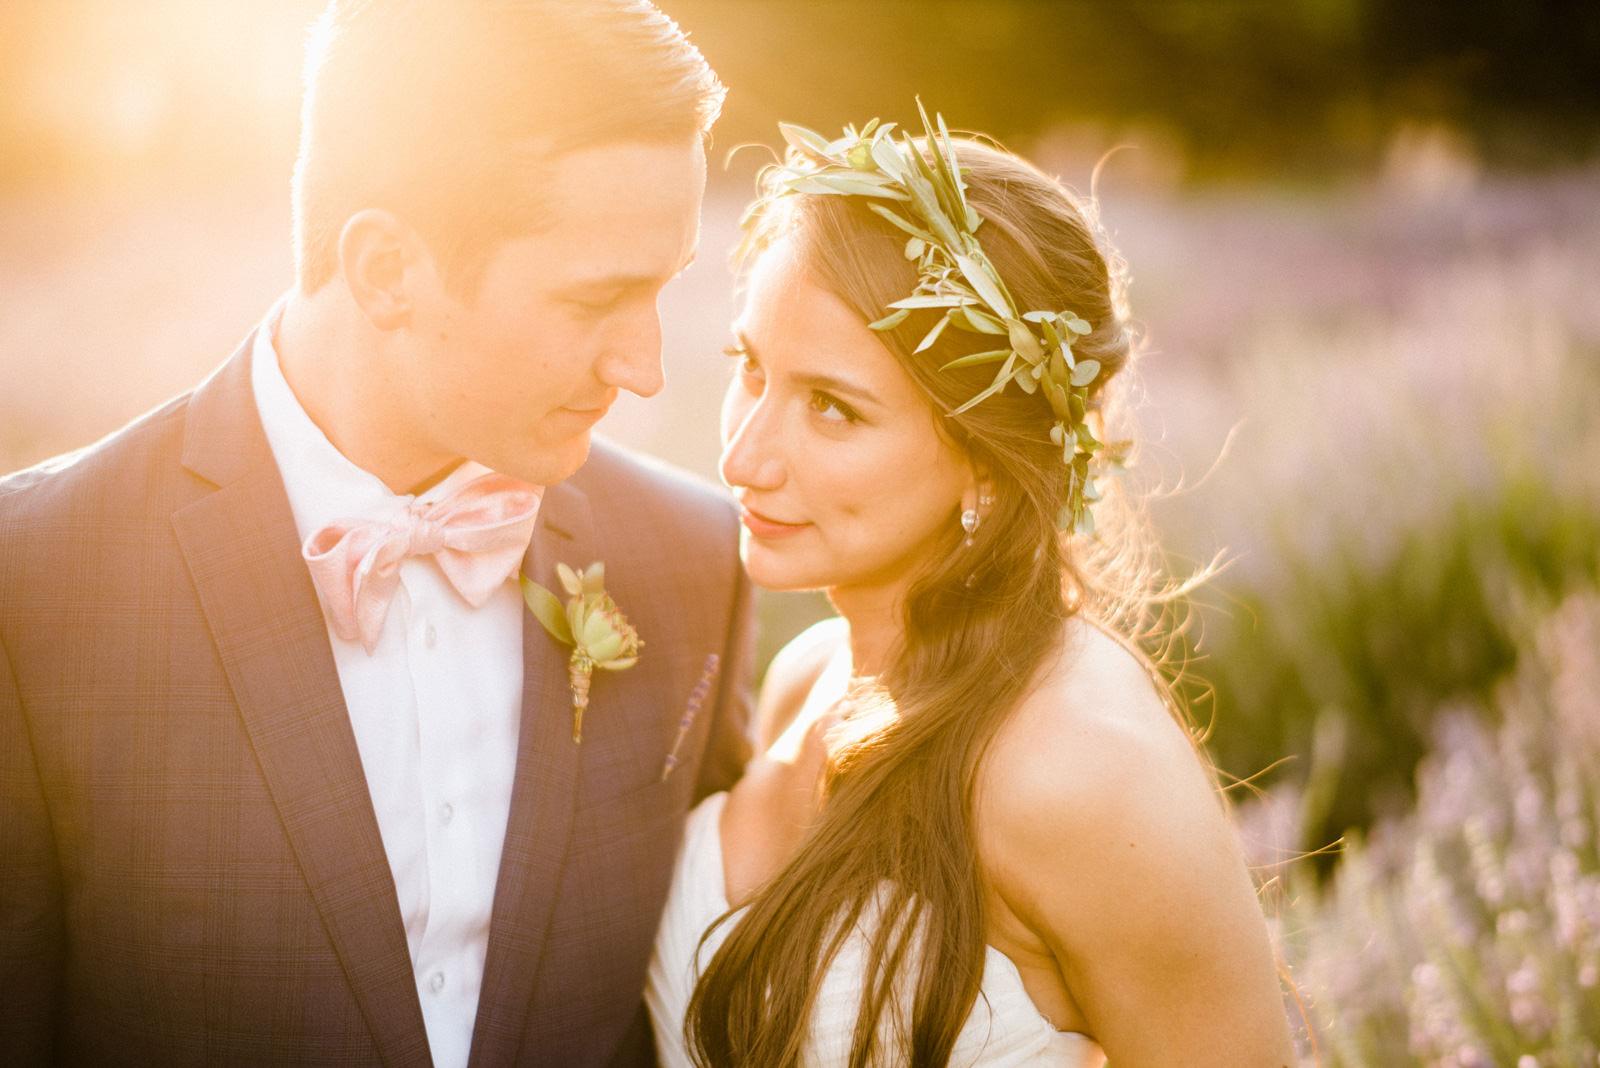 097-woodinville-lavendar-farm-wedding-with-golden-glowy-photos.jpg